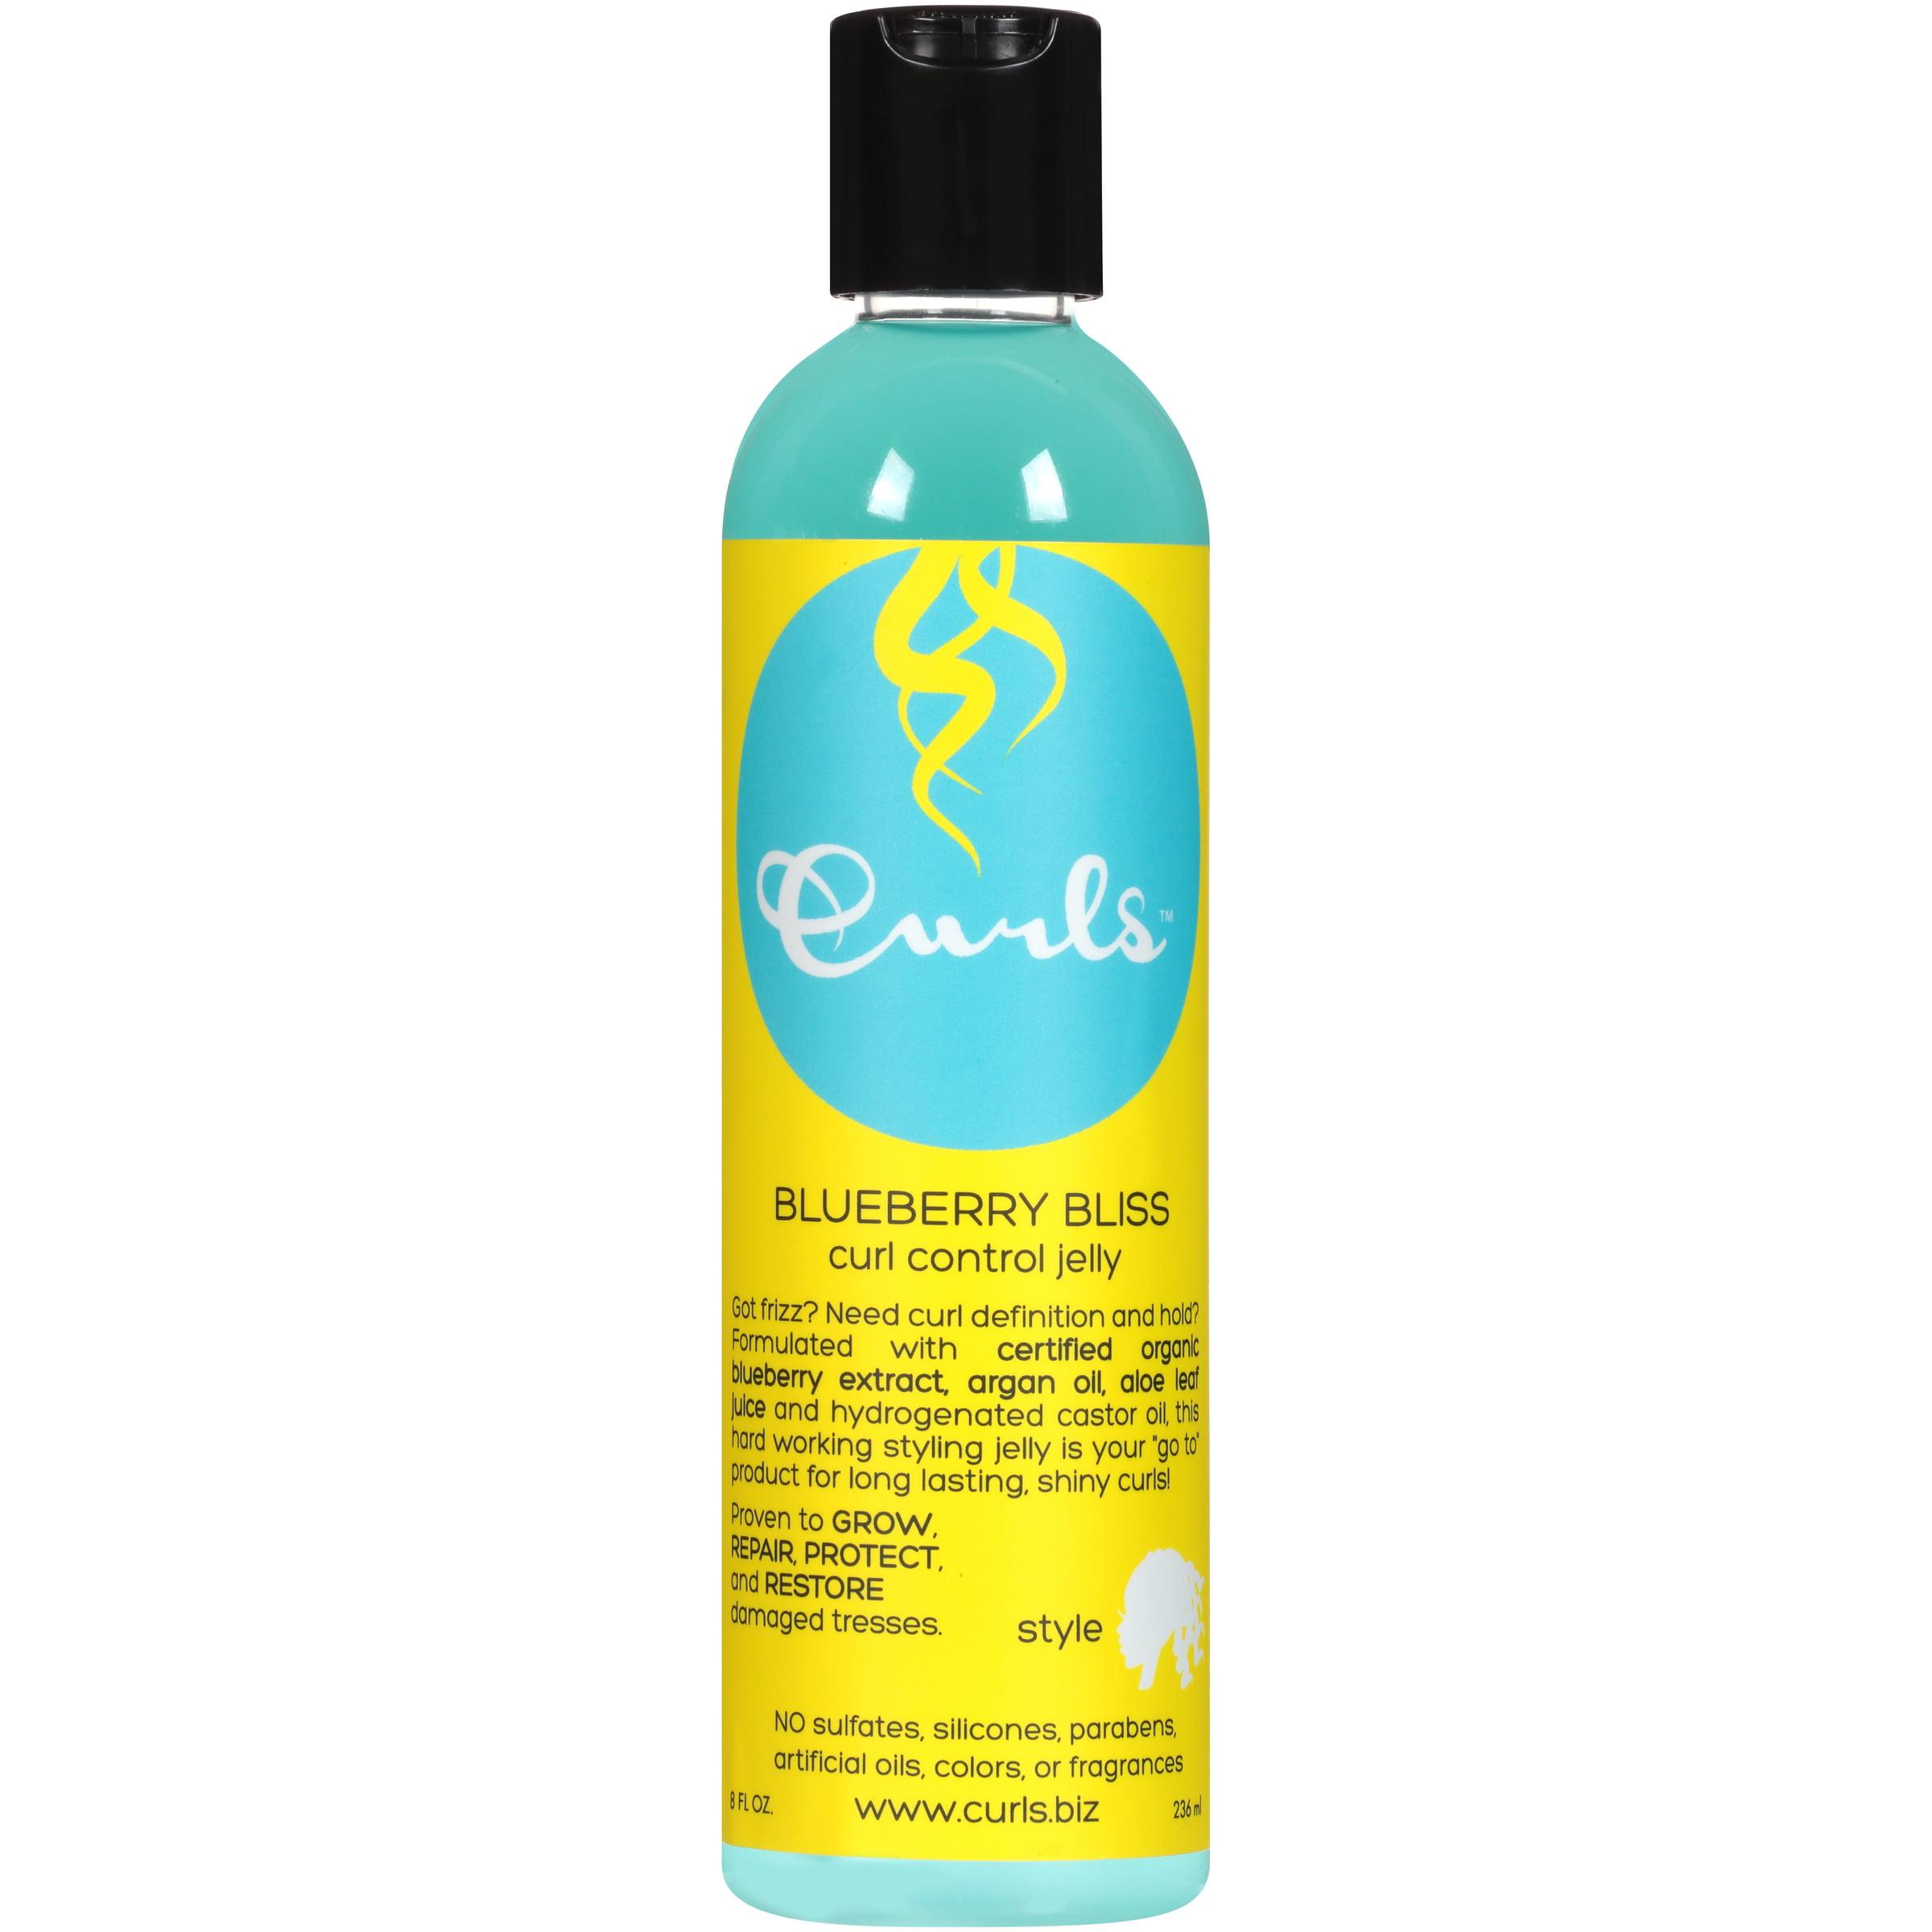 Curls Blueberry Bliss Curl Control Jelly, 12 fl oz bottle   Walmart.com